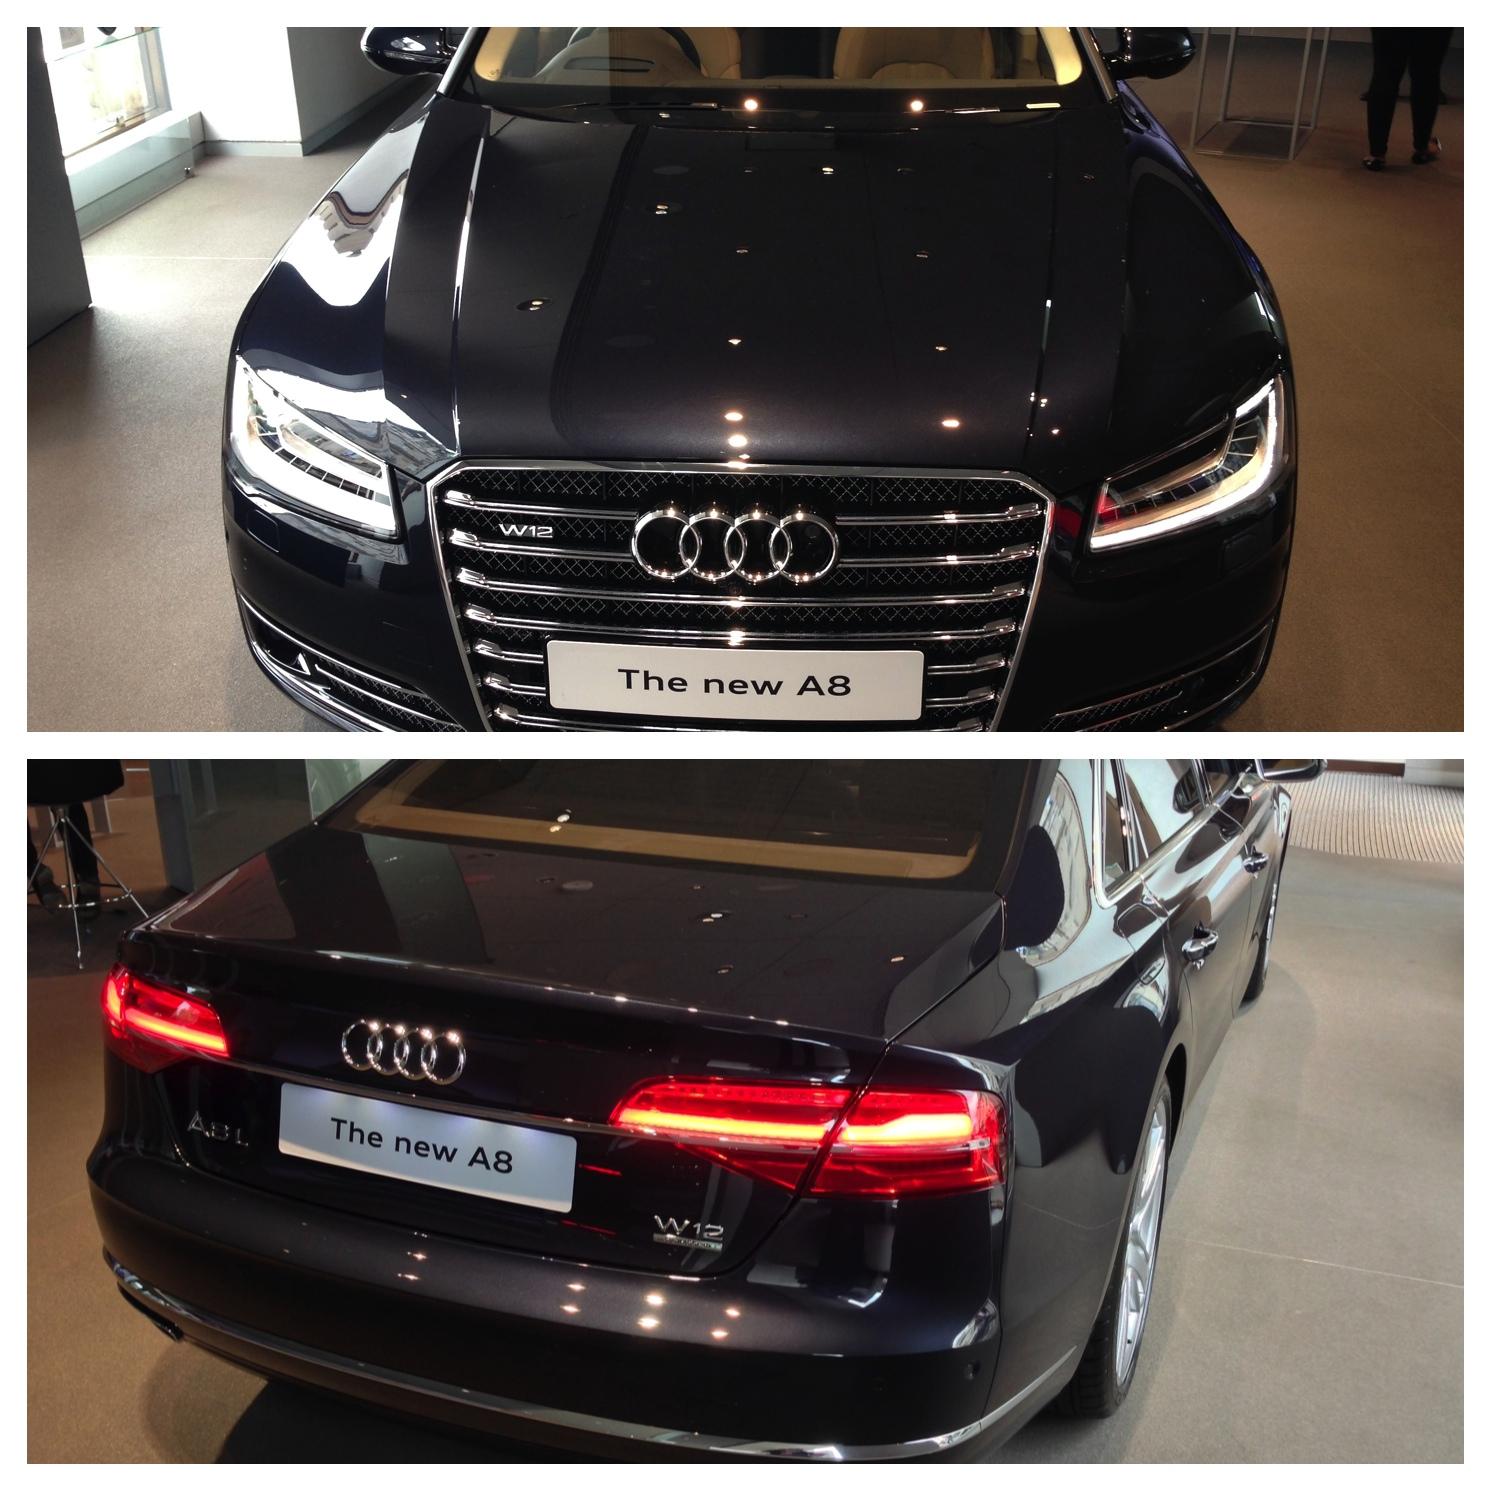 Coolest Car? Audi A8 W12 - Cars & Life